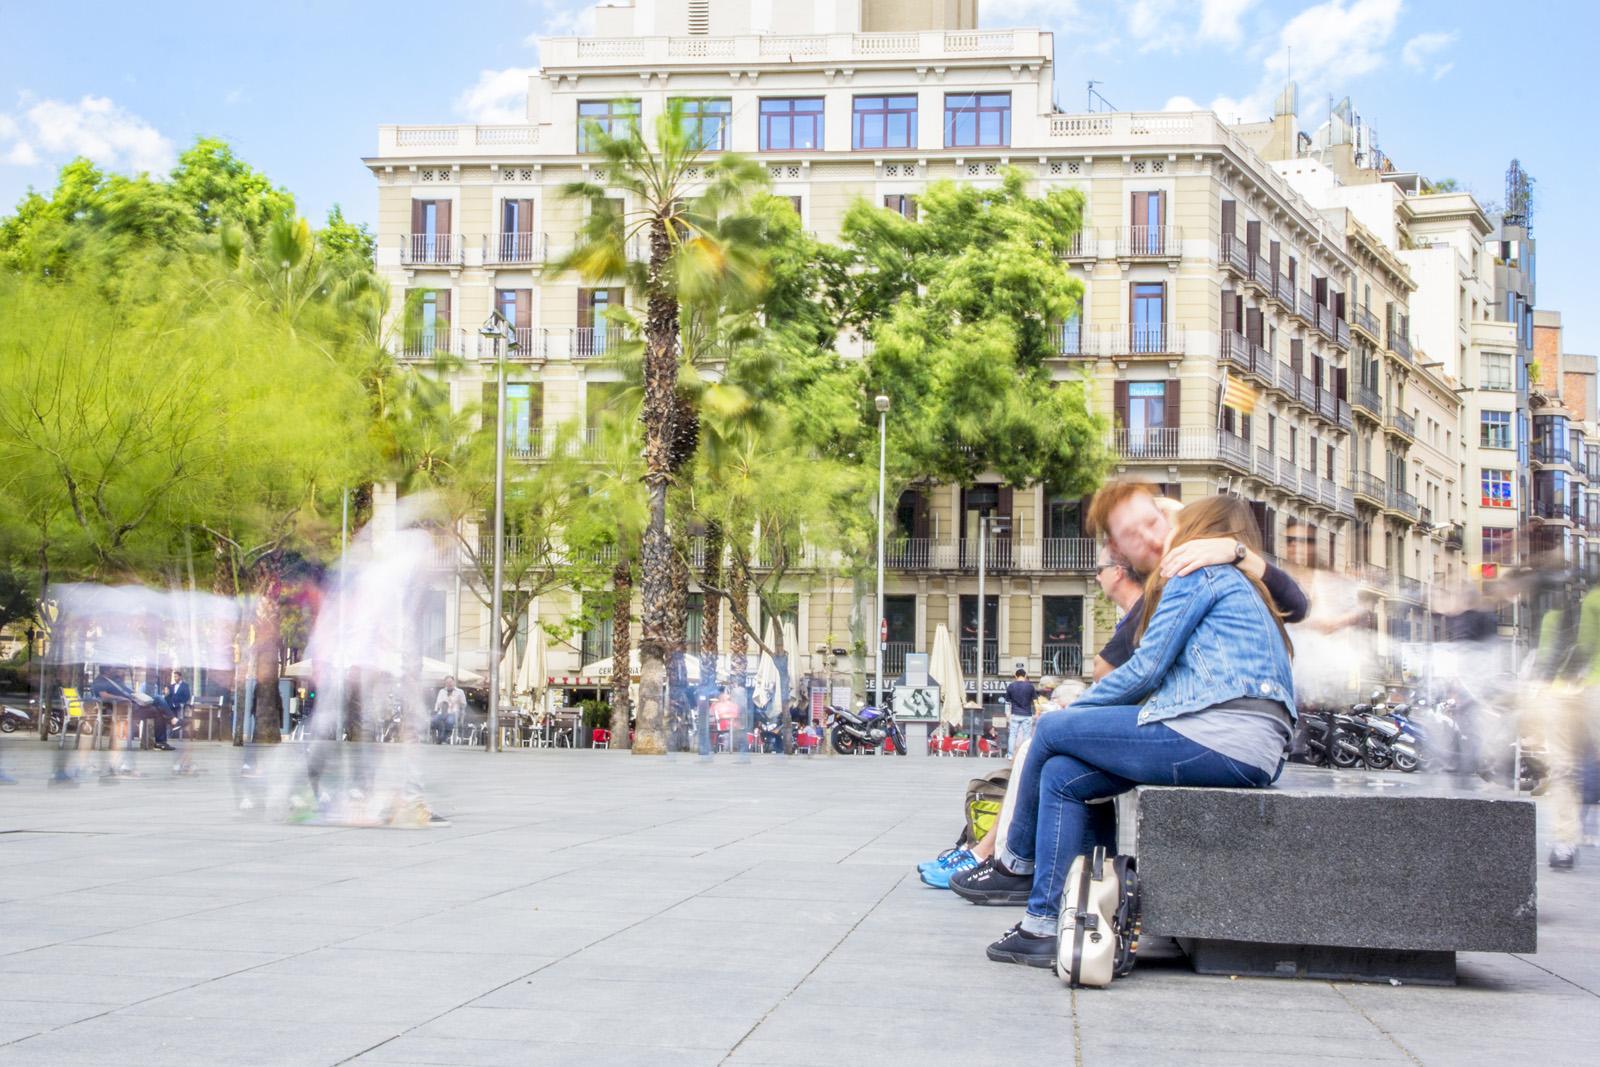 Kisses on plaza Universtitat, Barcelona